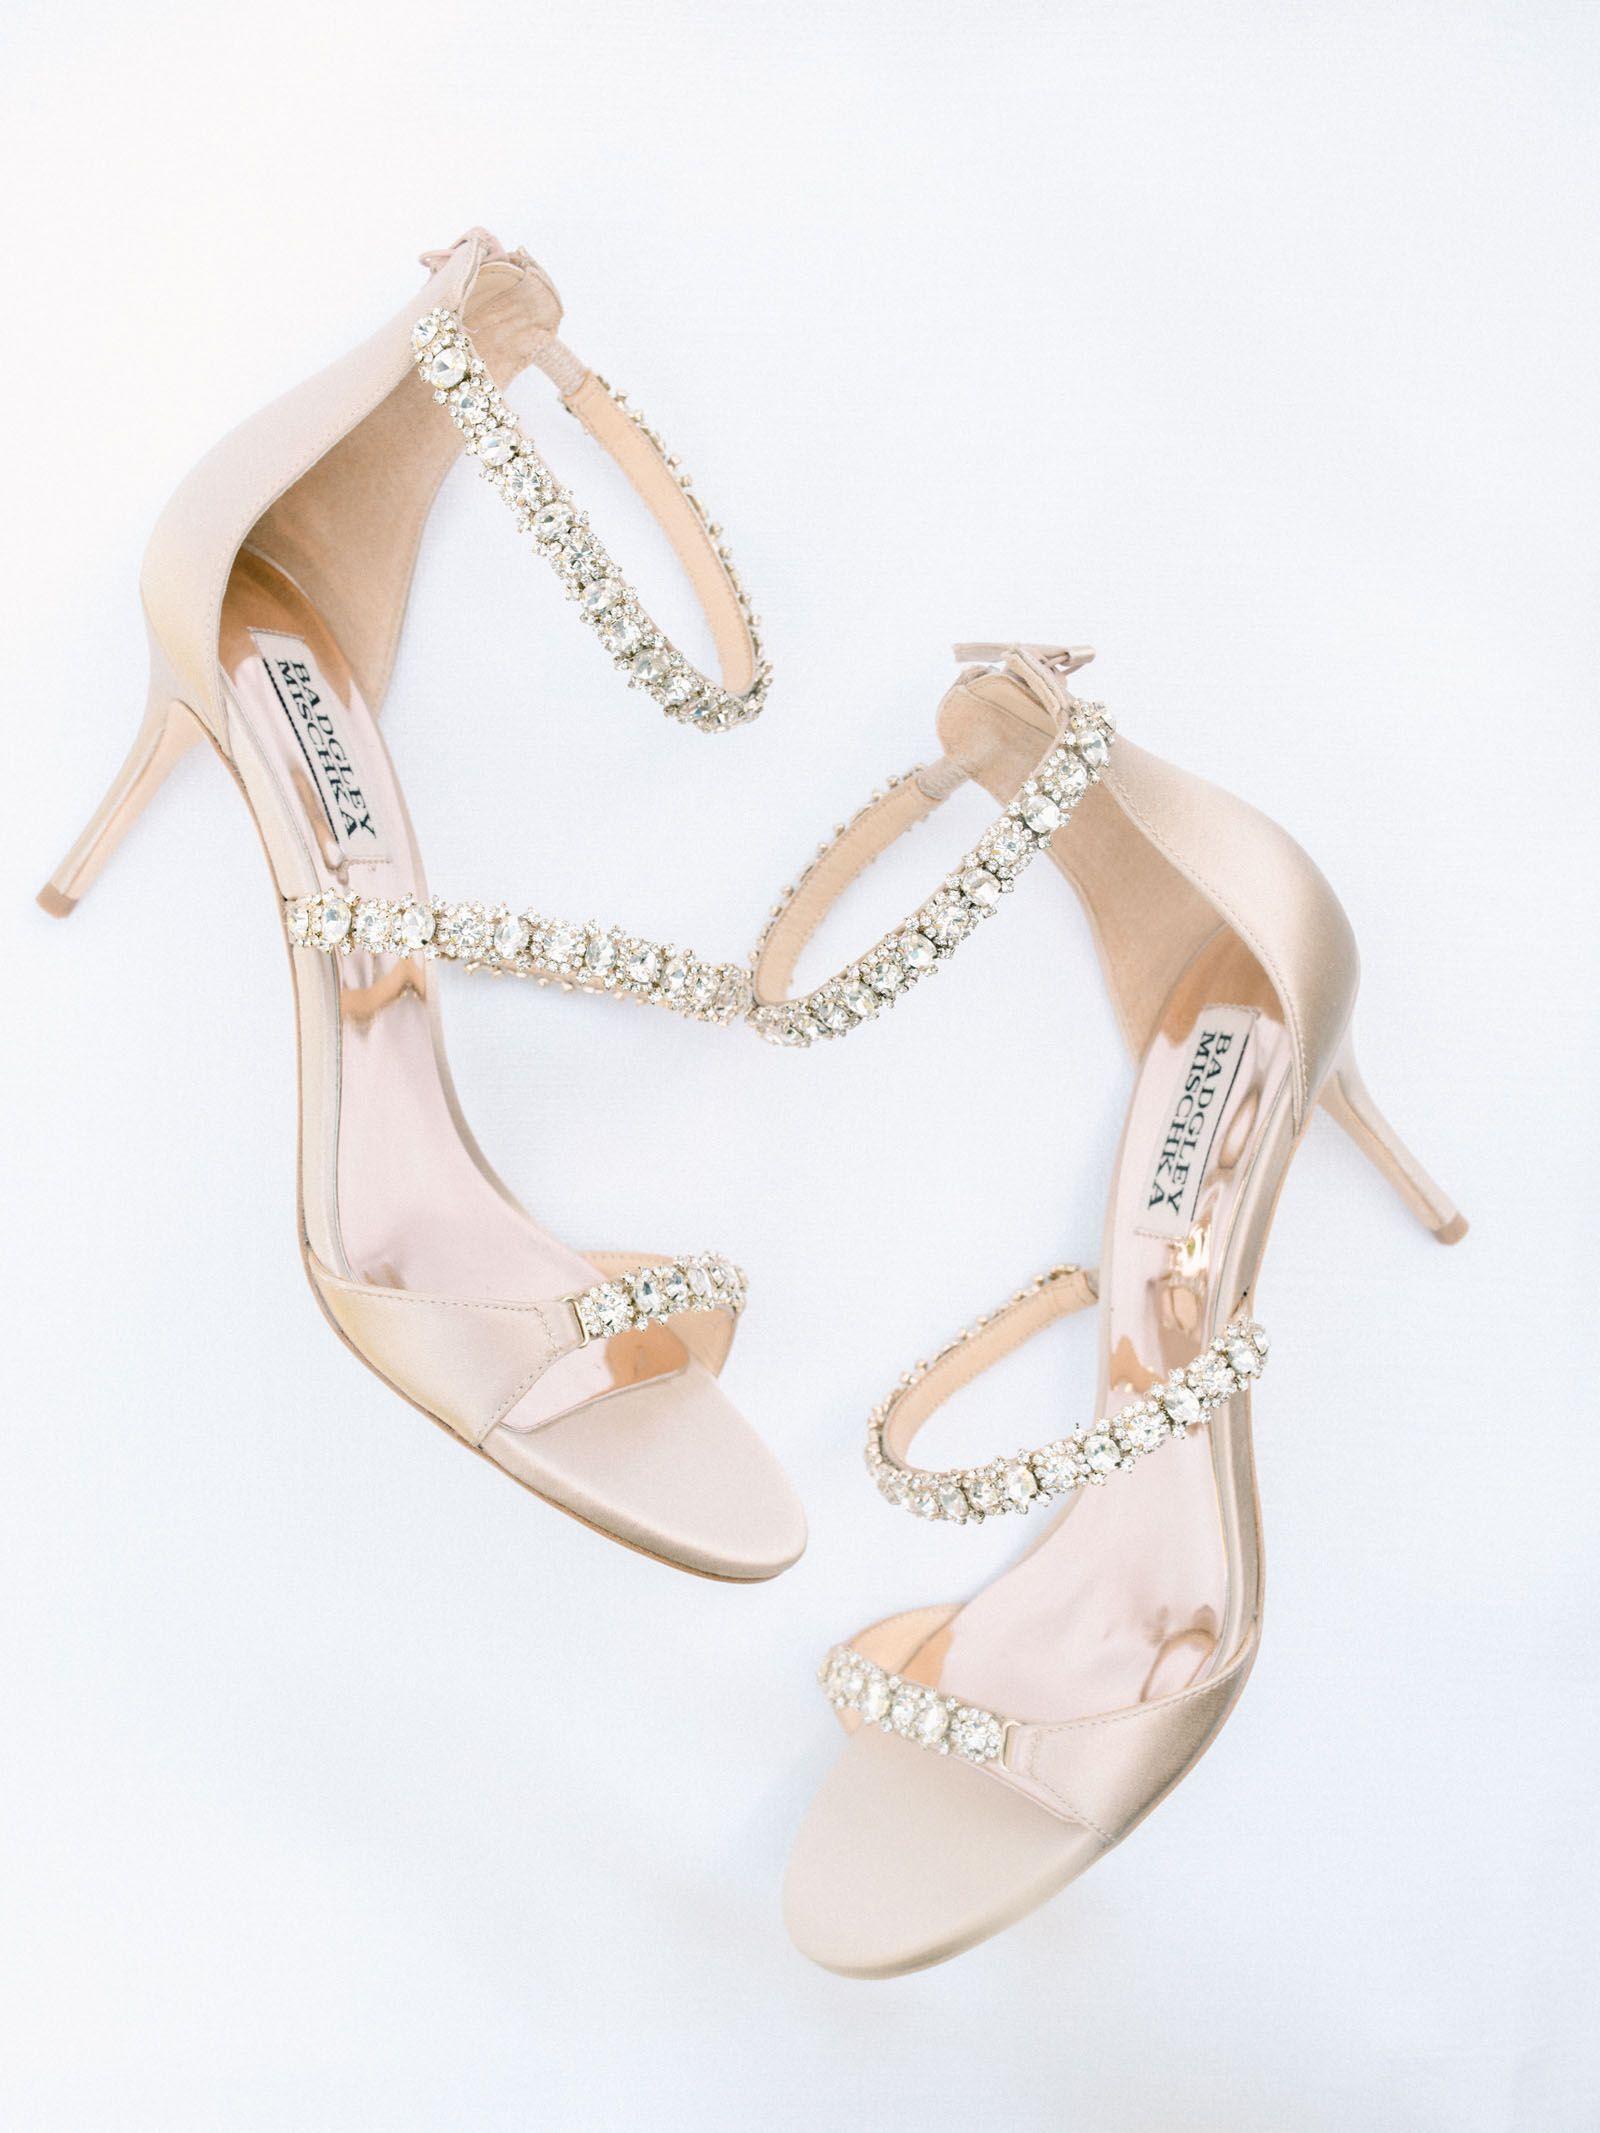 Toronto Wedding At The Gardiner Museum From Lavish Light Photography Valentino Wedding Shoes Wedding Shoes Bridal Shoes